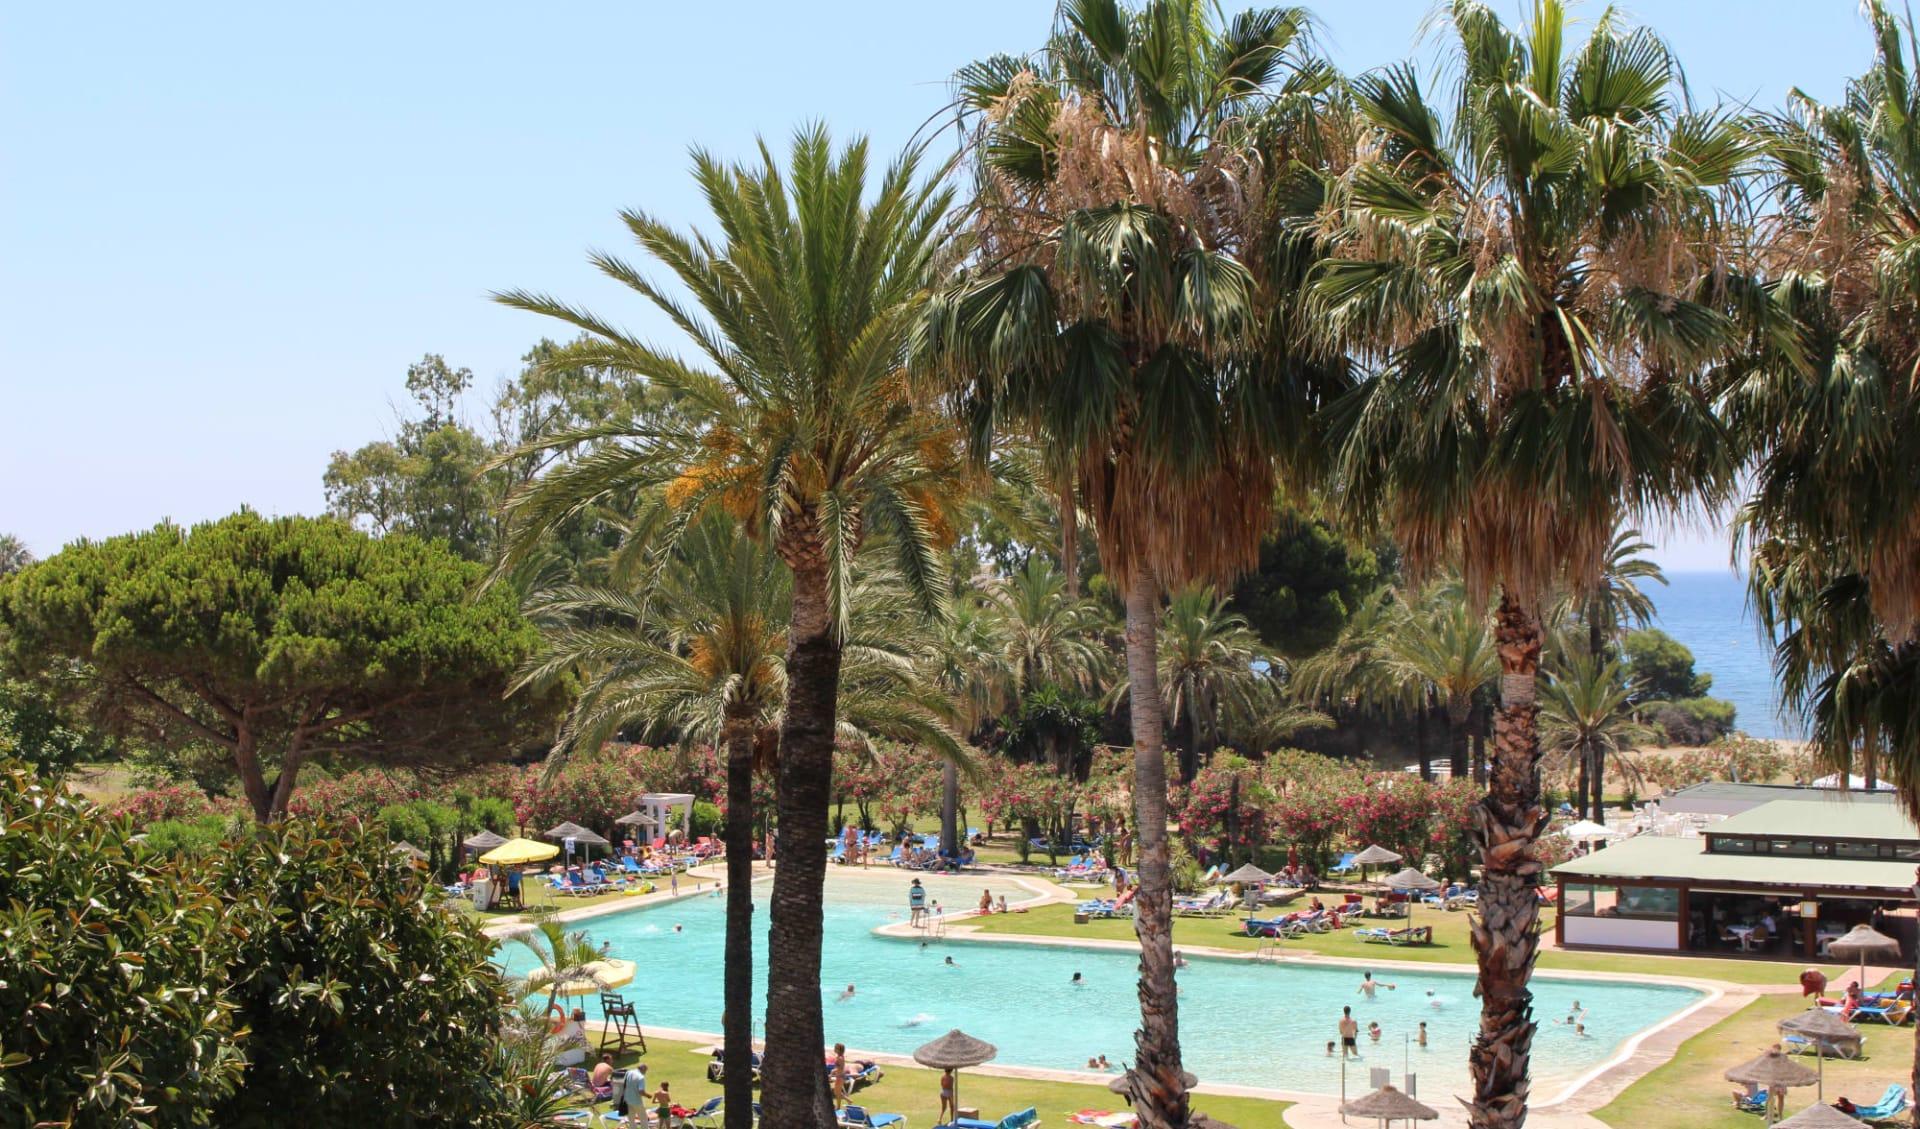 09.10. - 16.10.2021 Padel-Tennis Herbstferien ab Malaga: Atalaya - Pool